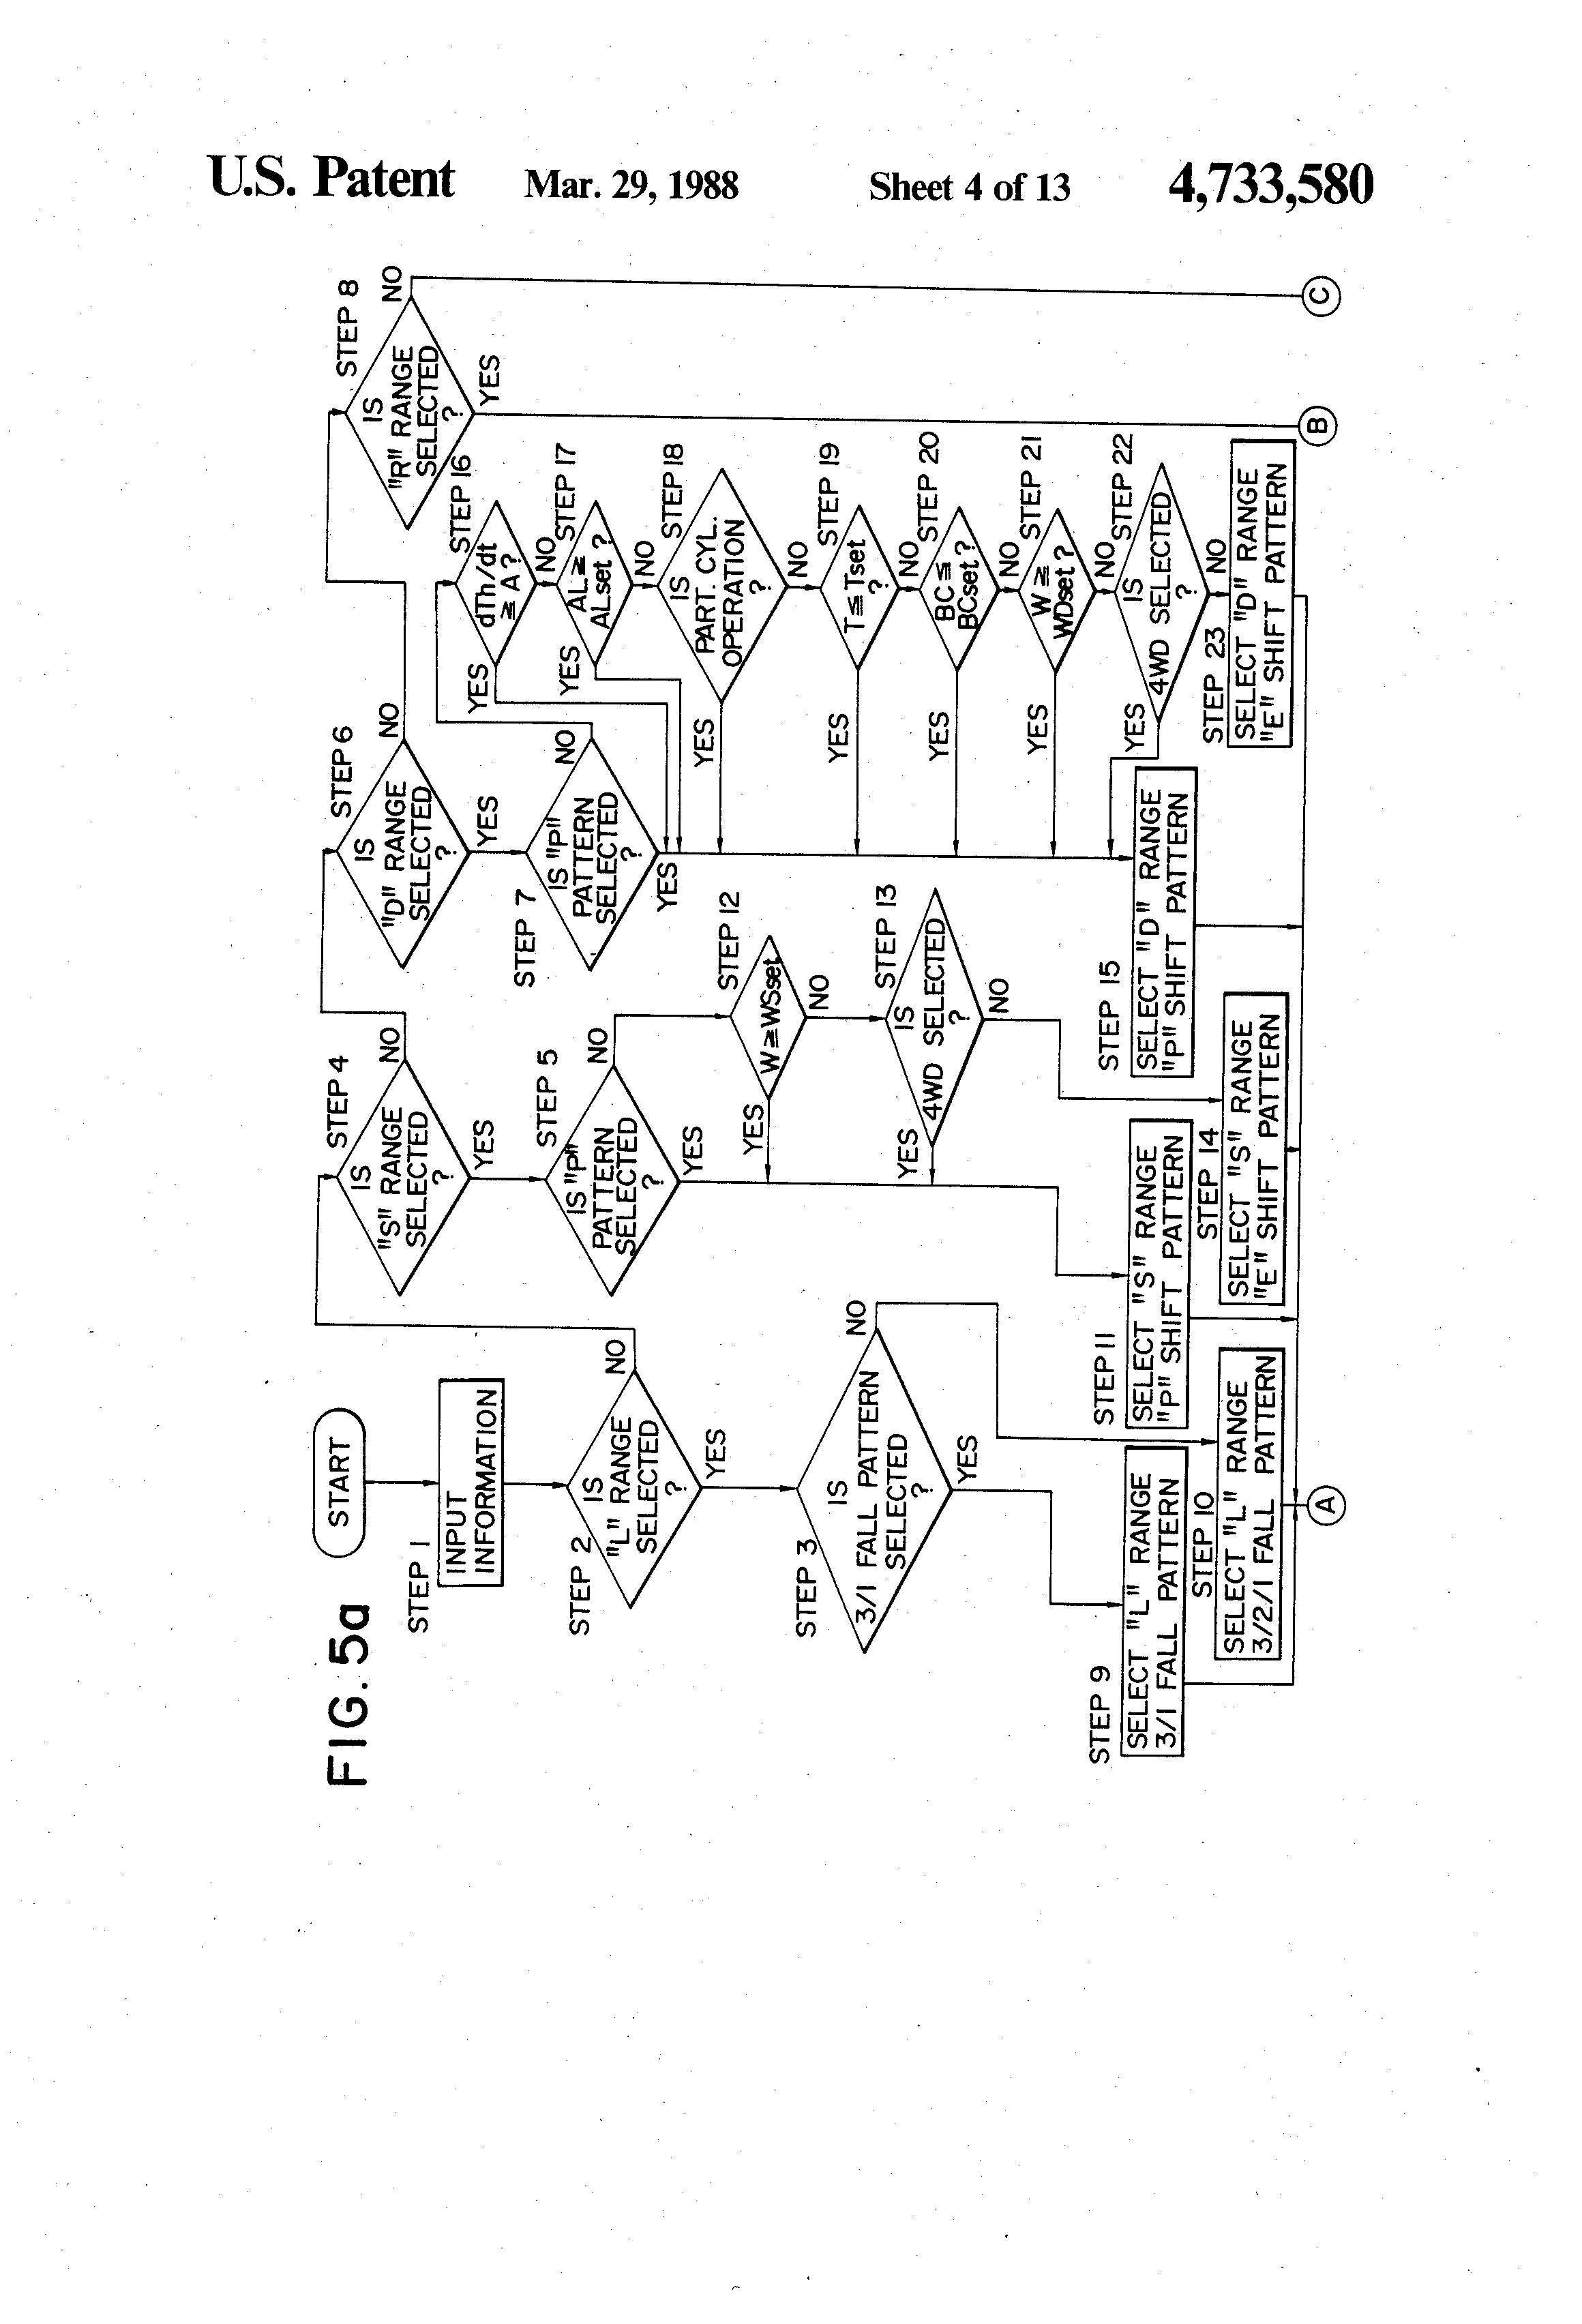 Mode of transmission-7649